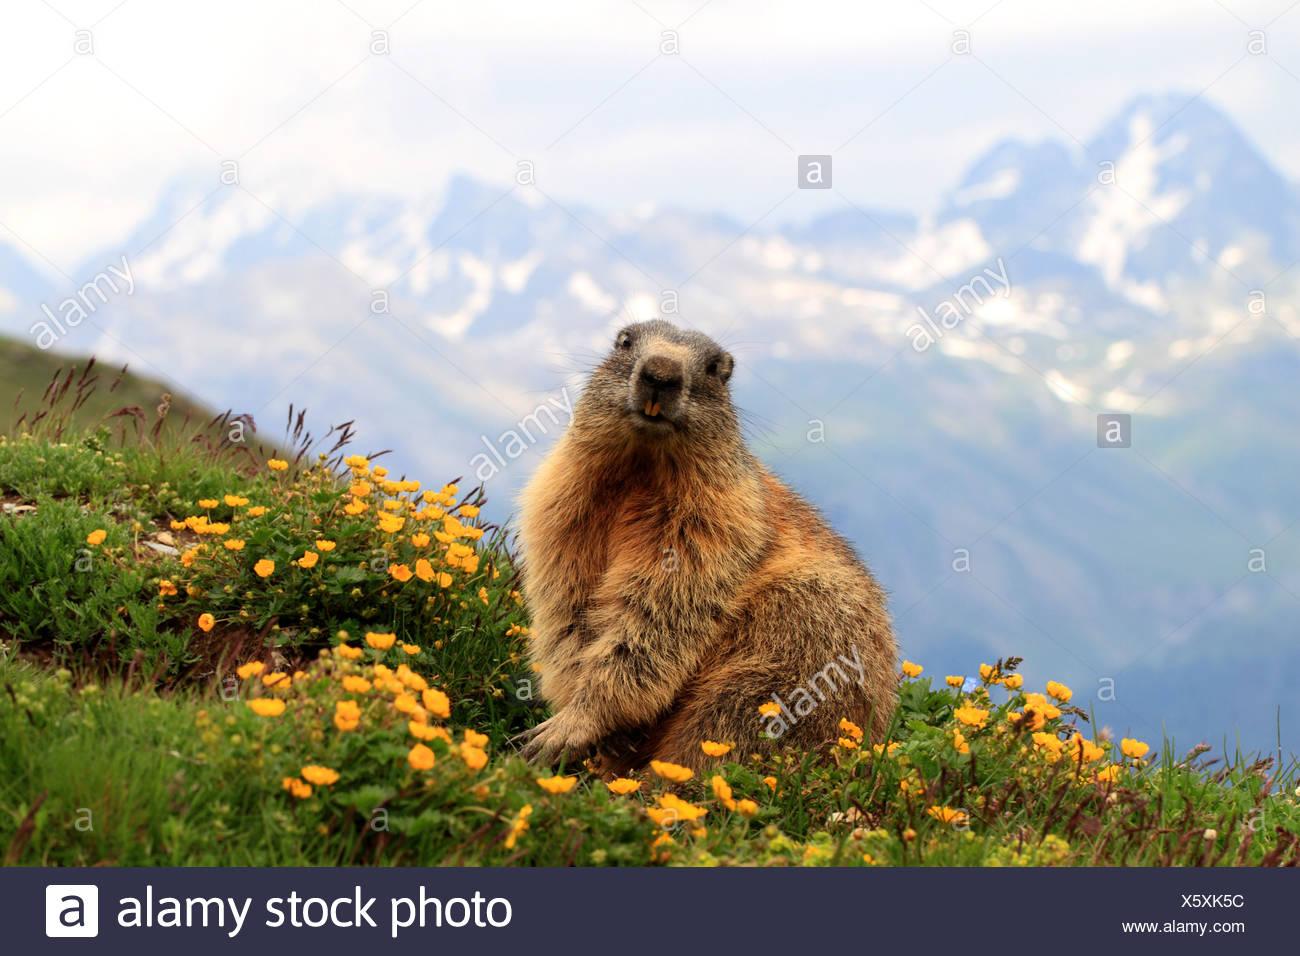 alpine marmot (Marmota marmota), in blooming mountain meadow, Switzerland, Engadine, Alp Languard Stock Photo